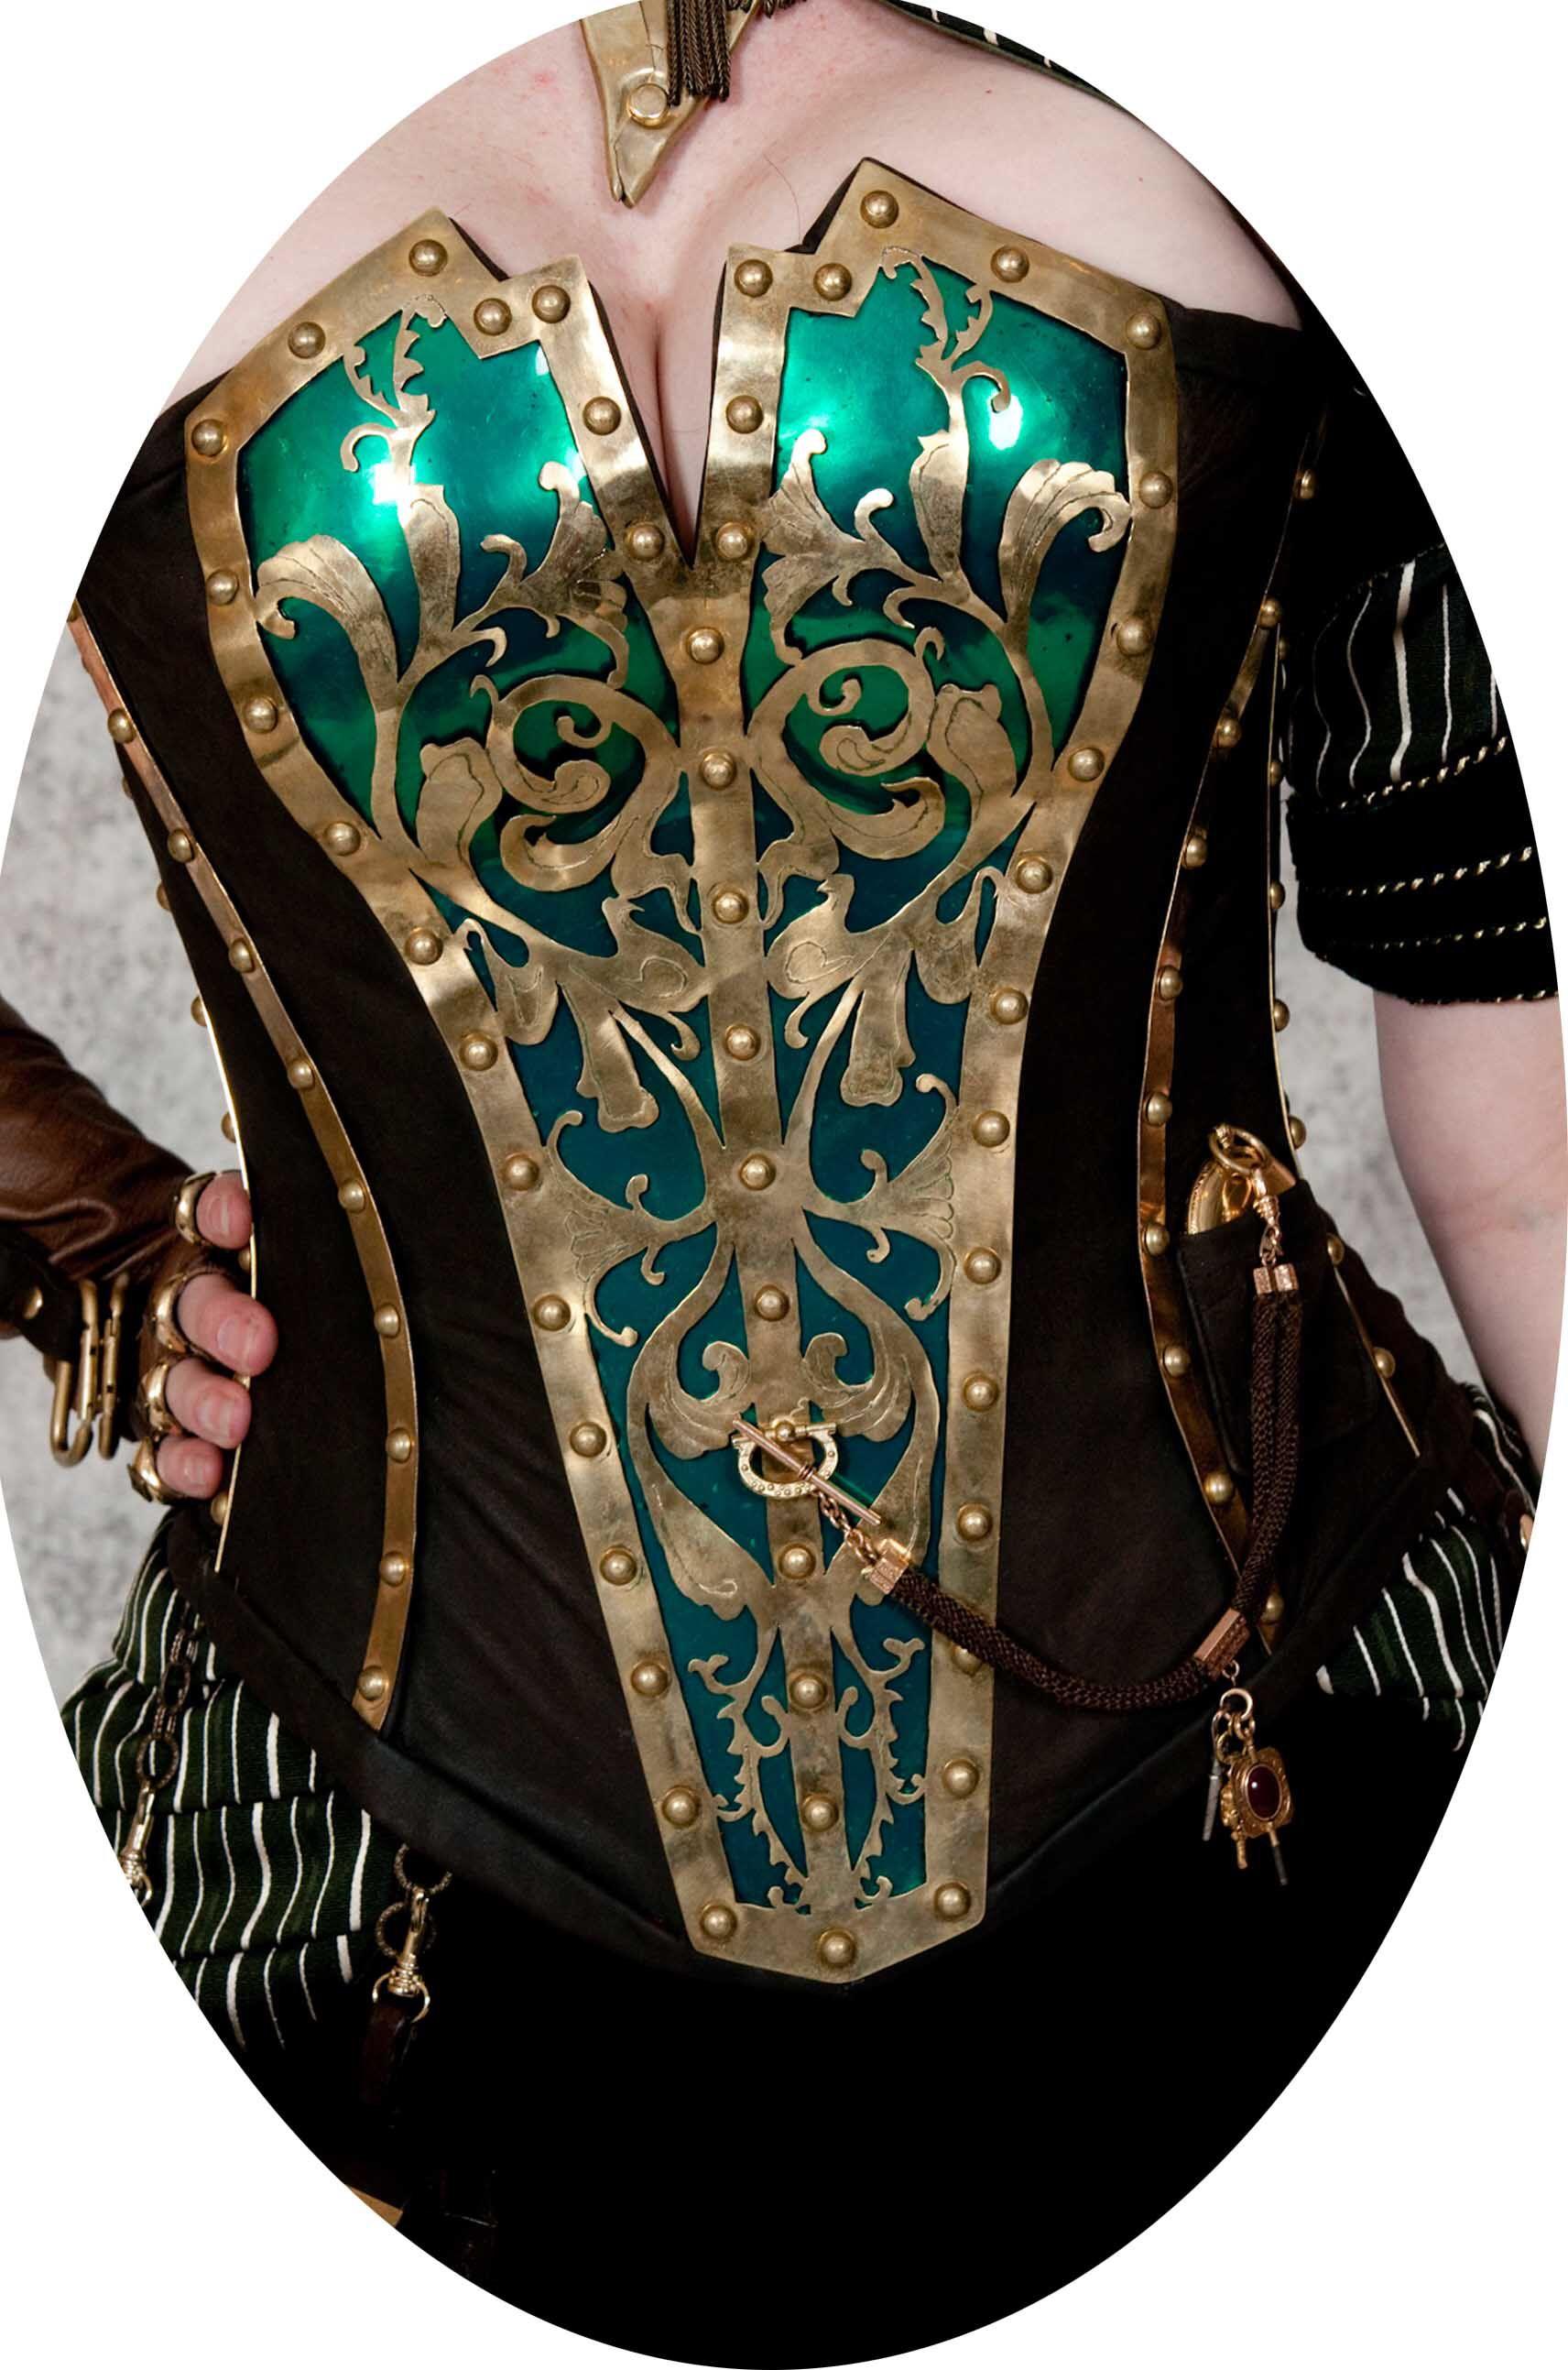 Image from http://designbynola.com/wp-content/uploads/2011/07/brass-corset-close-up.jpg.